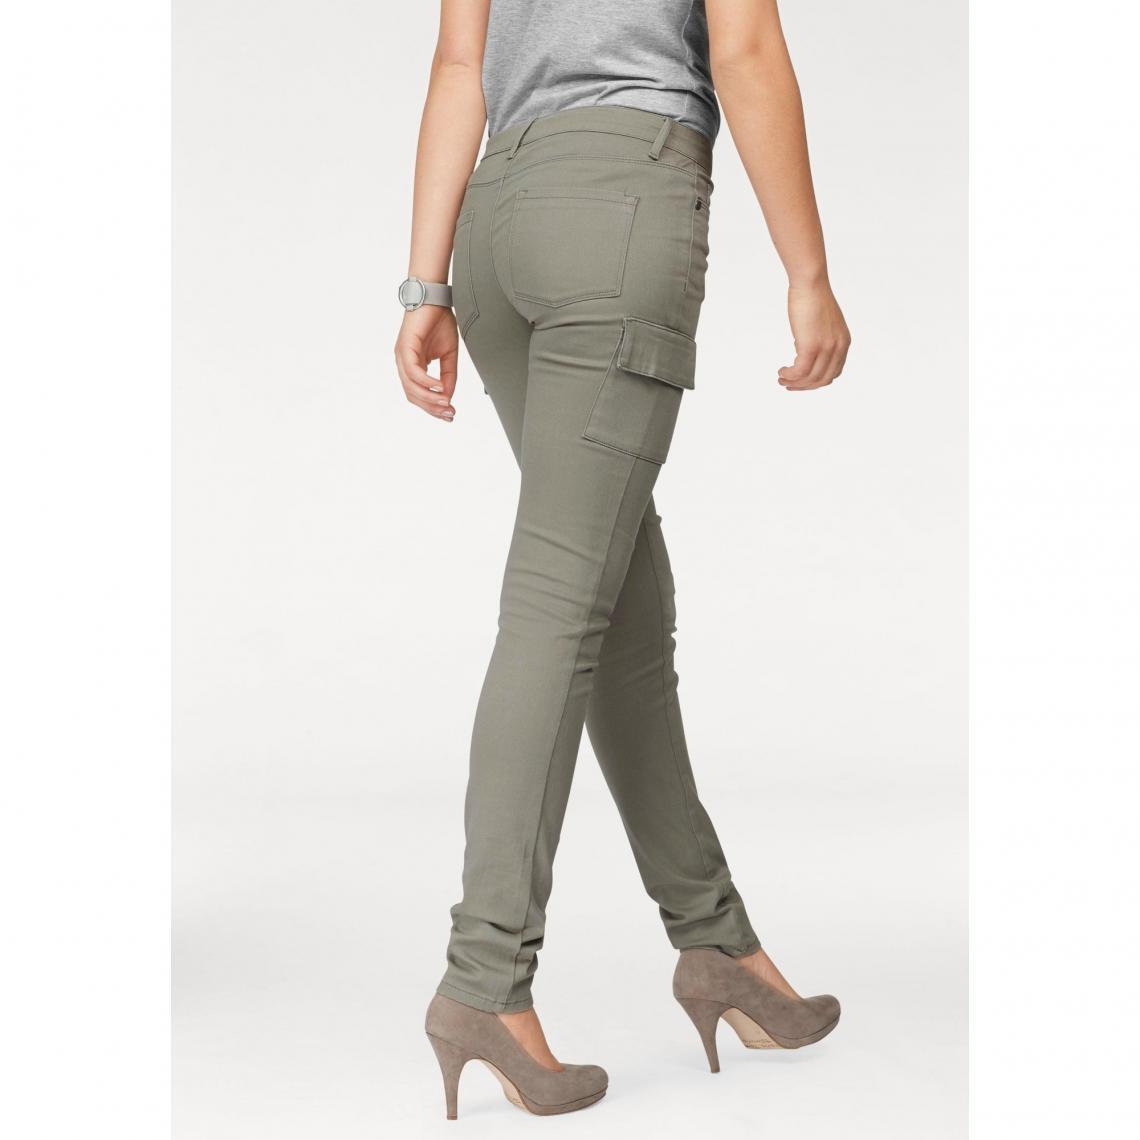 6e4e8581f0706 Jean skinny style cargo en twill coton/stretch femme Arizona - Roseau Vert